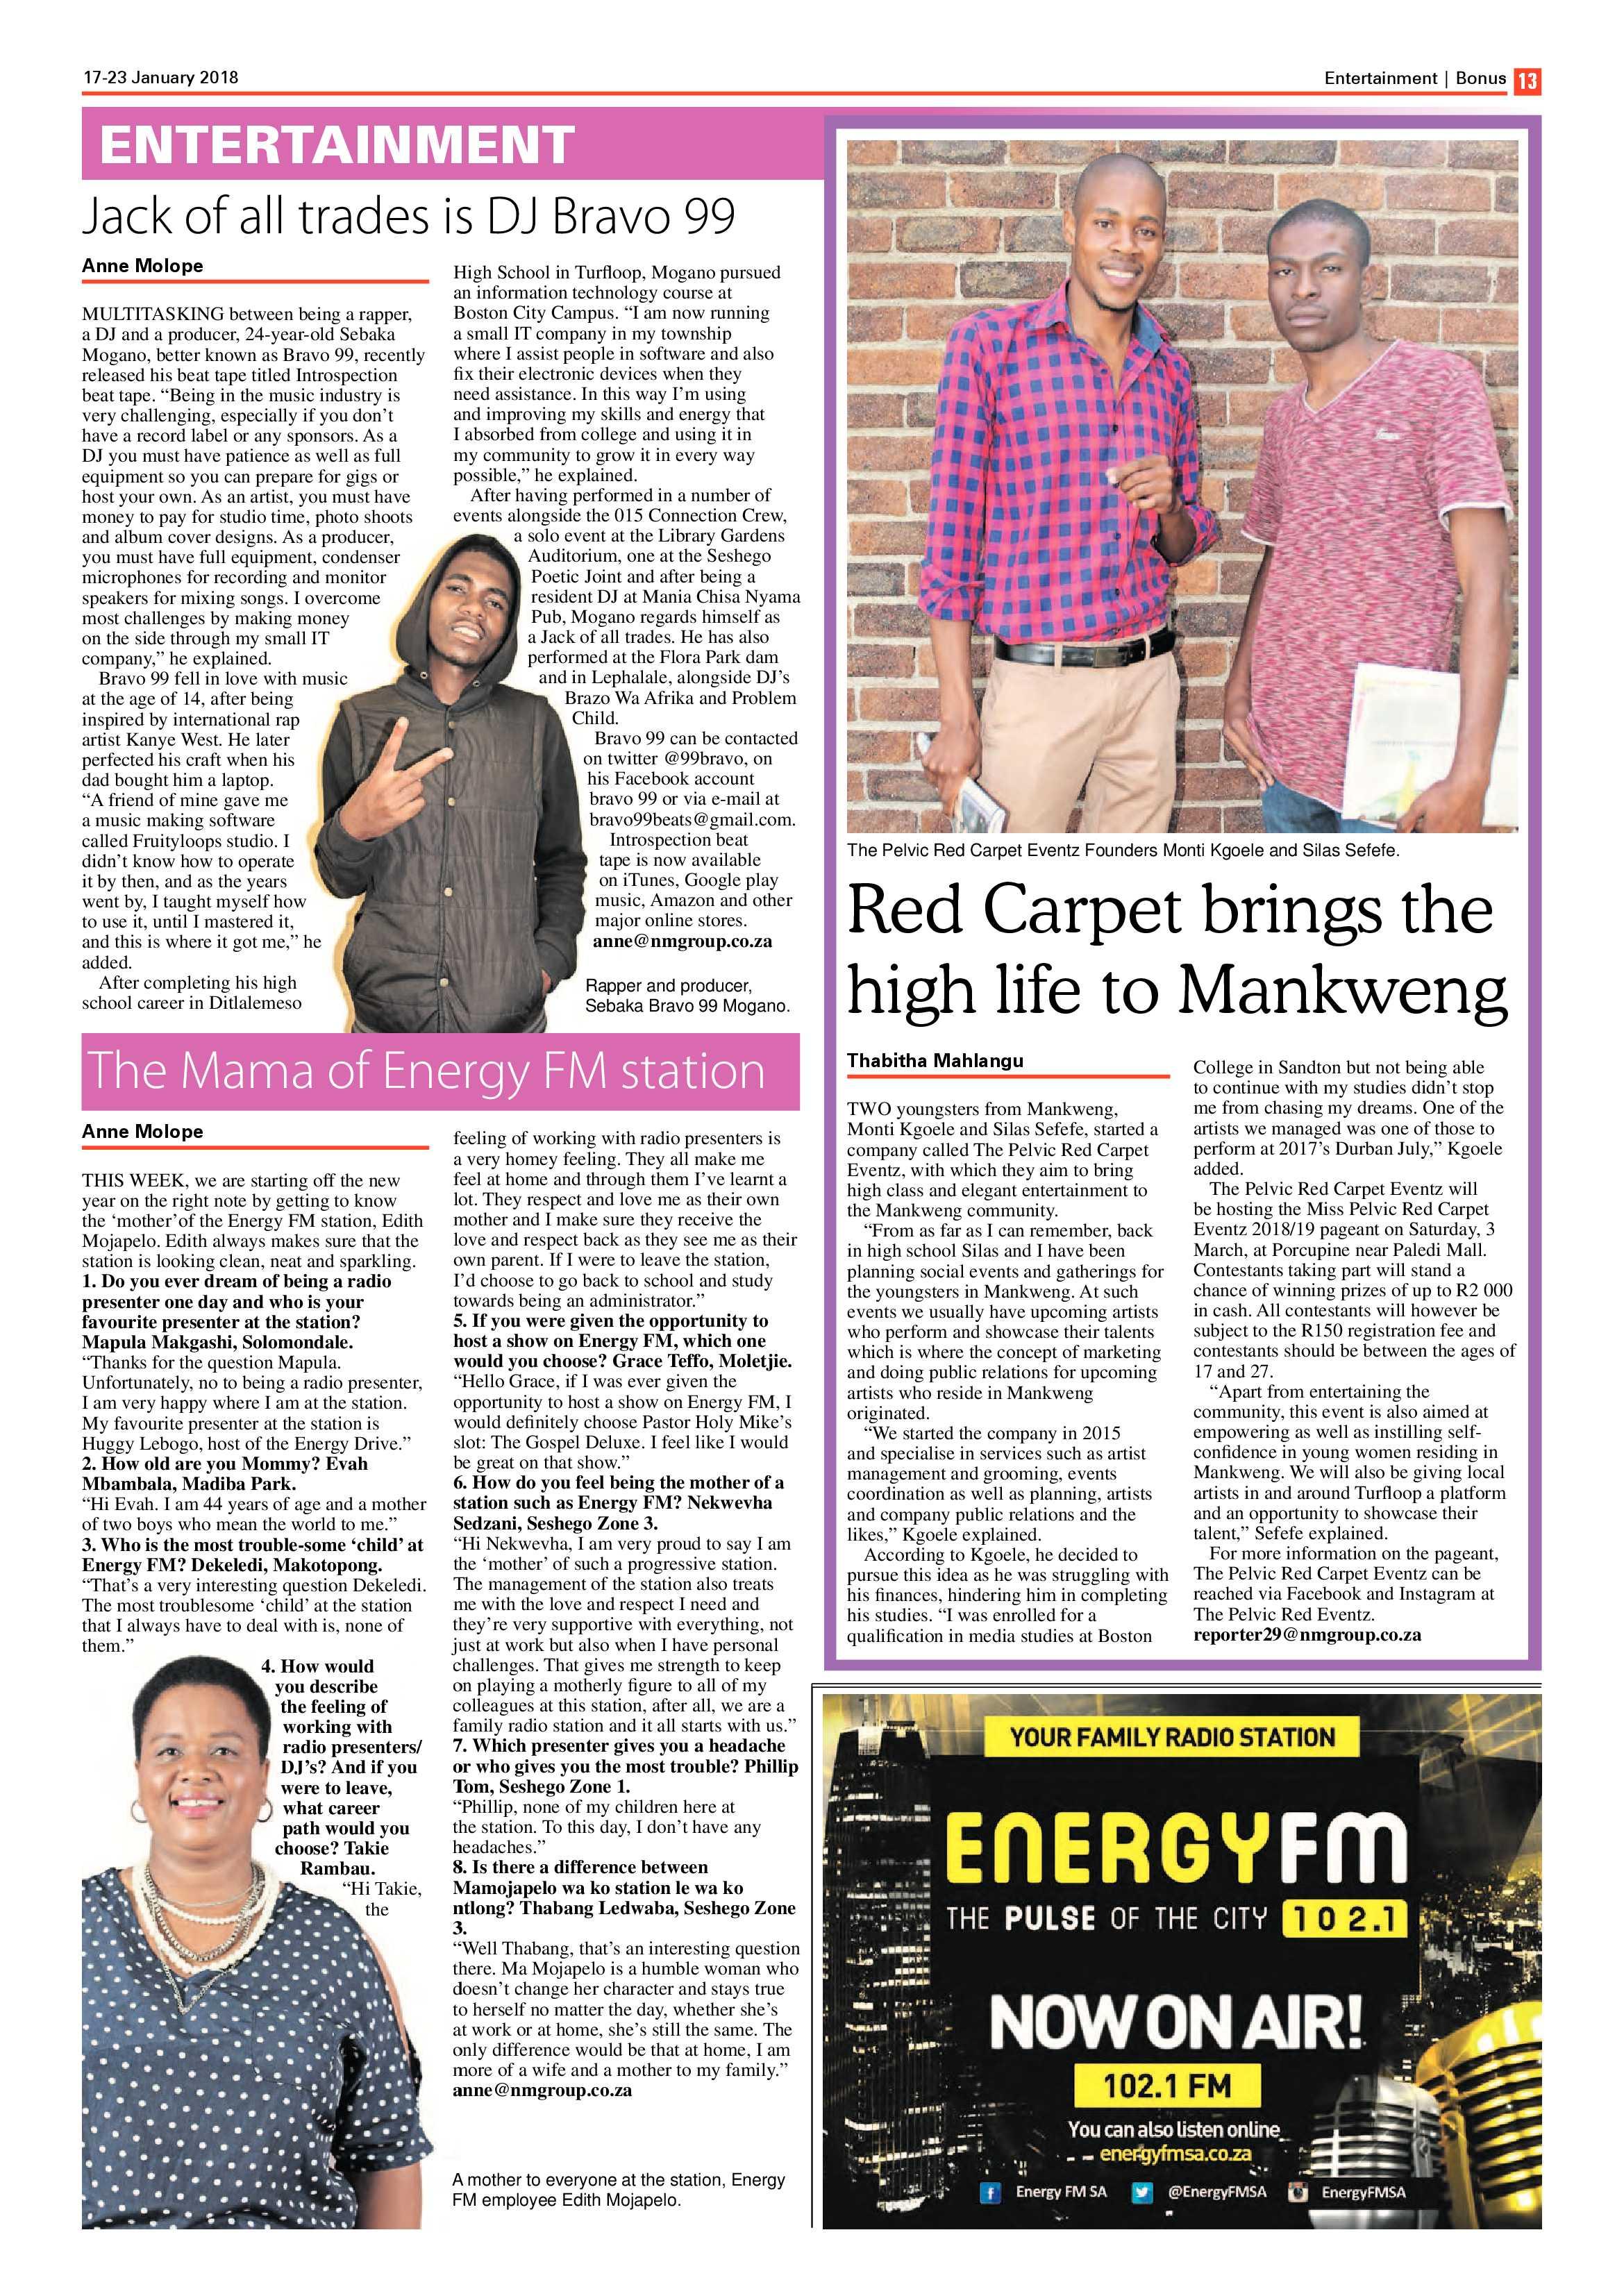 review-bonus-17-january-2018-epapers-page-13